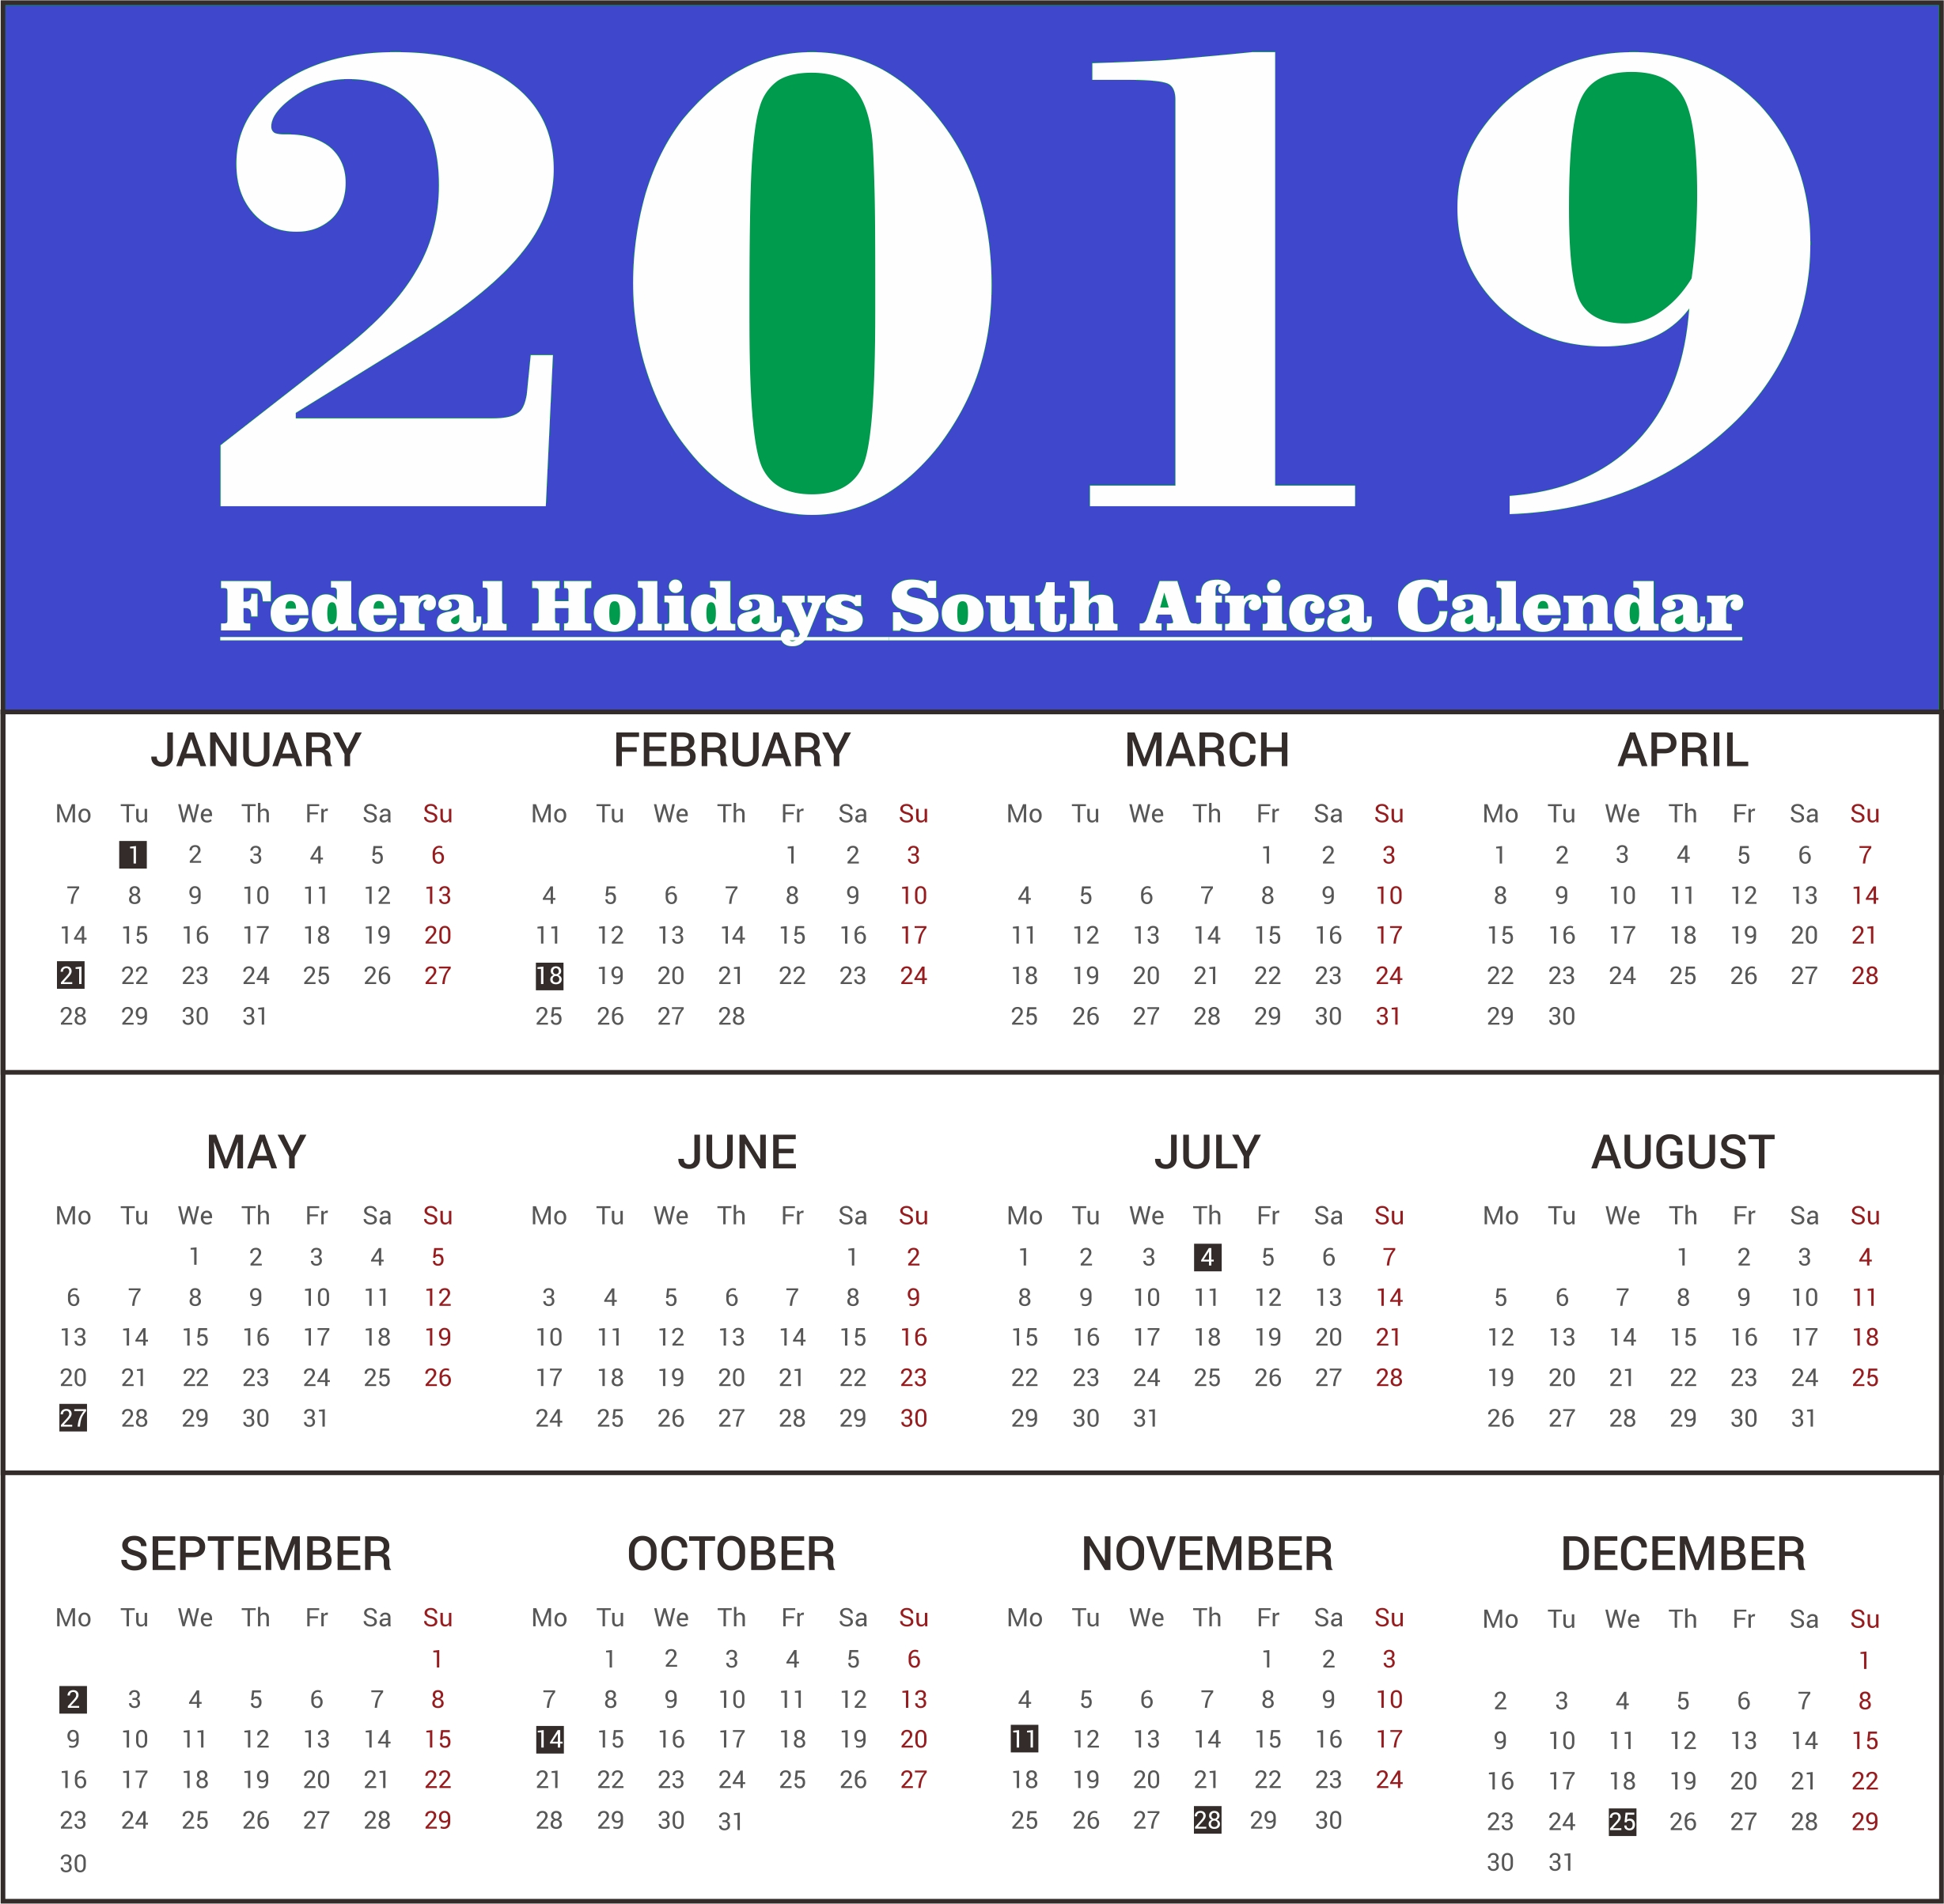 2019 South Africa Federal Holidays Calendar #southafrica #calendar Calendar Printing South Africa